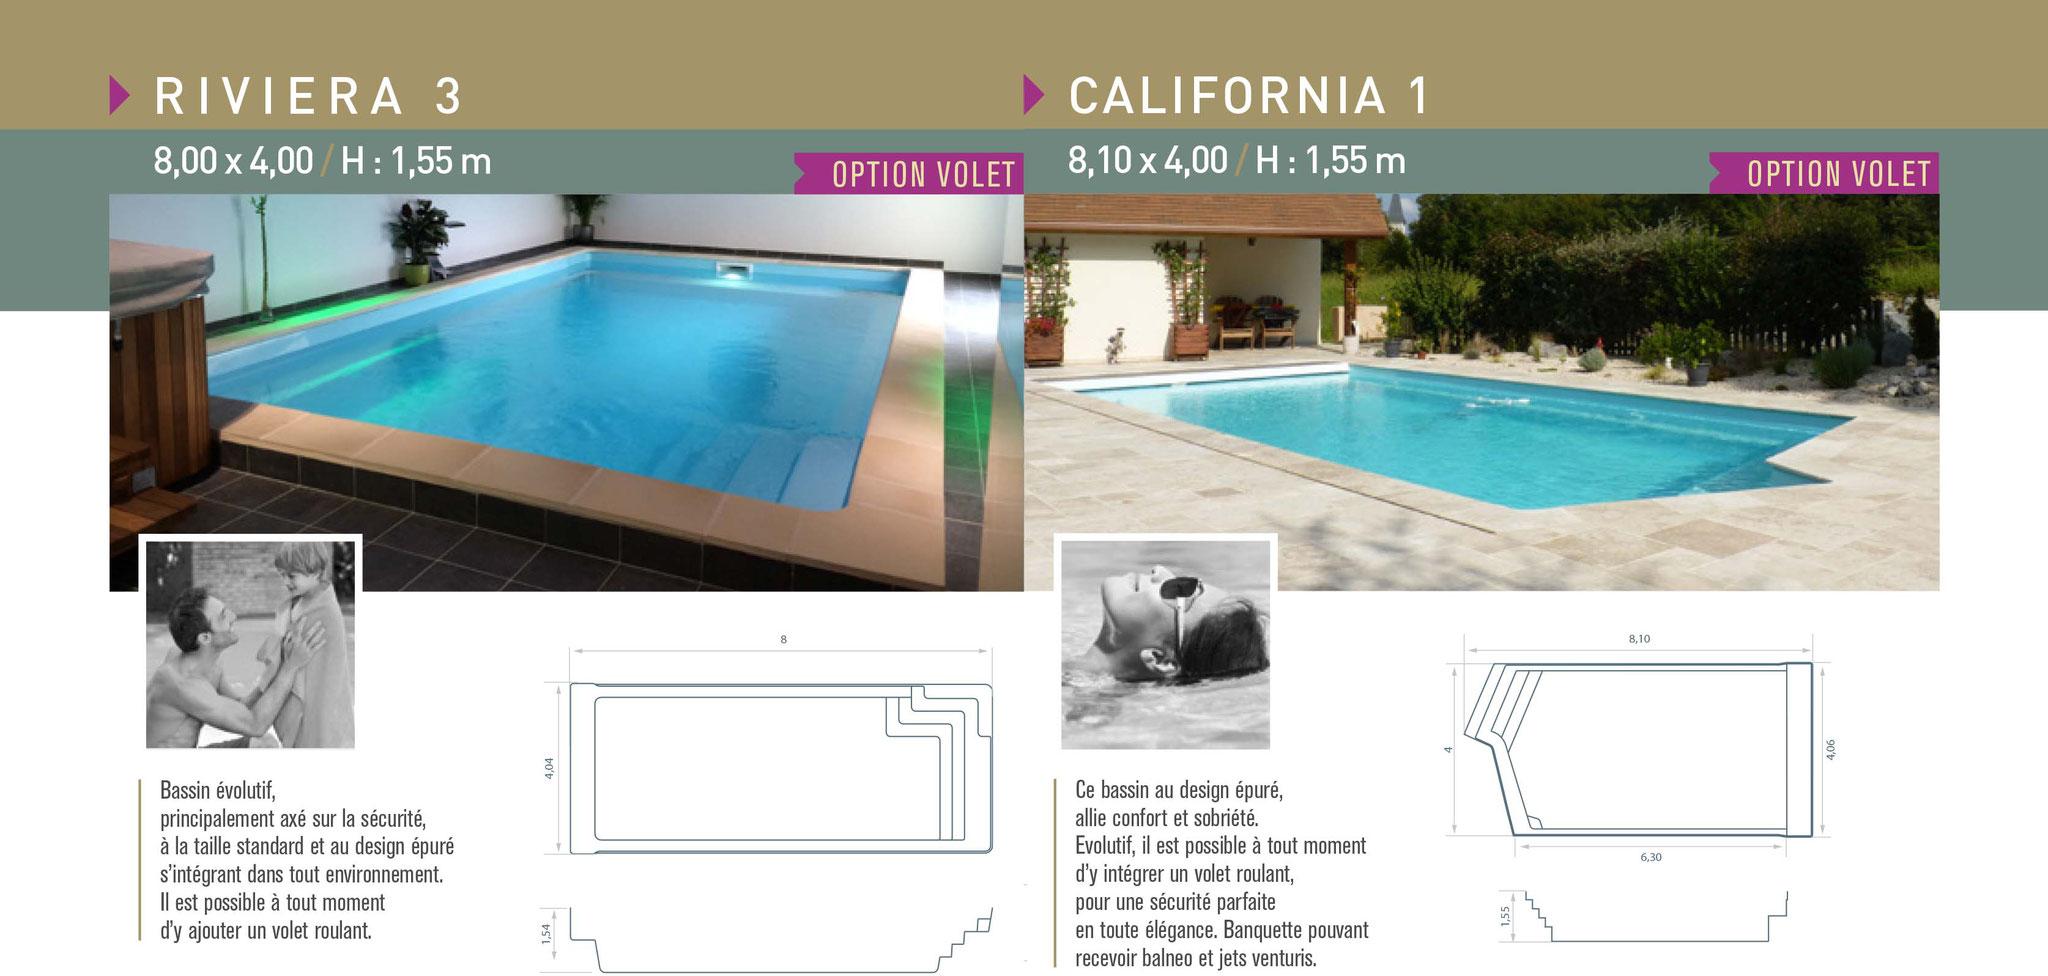 Nos best sellers de bassins en fond plat : piscines IBIZA Riviera 3 et California 1